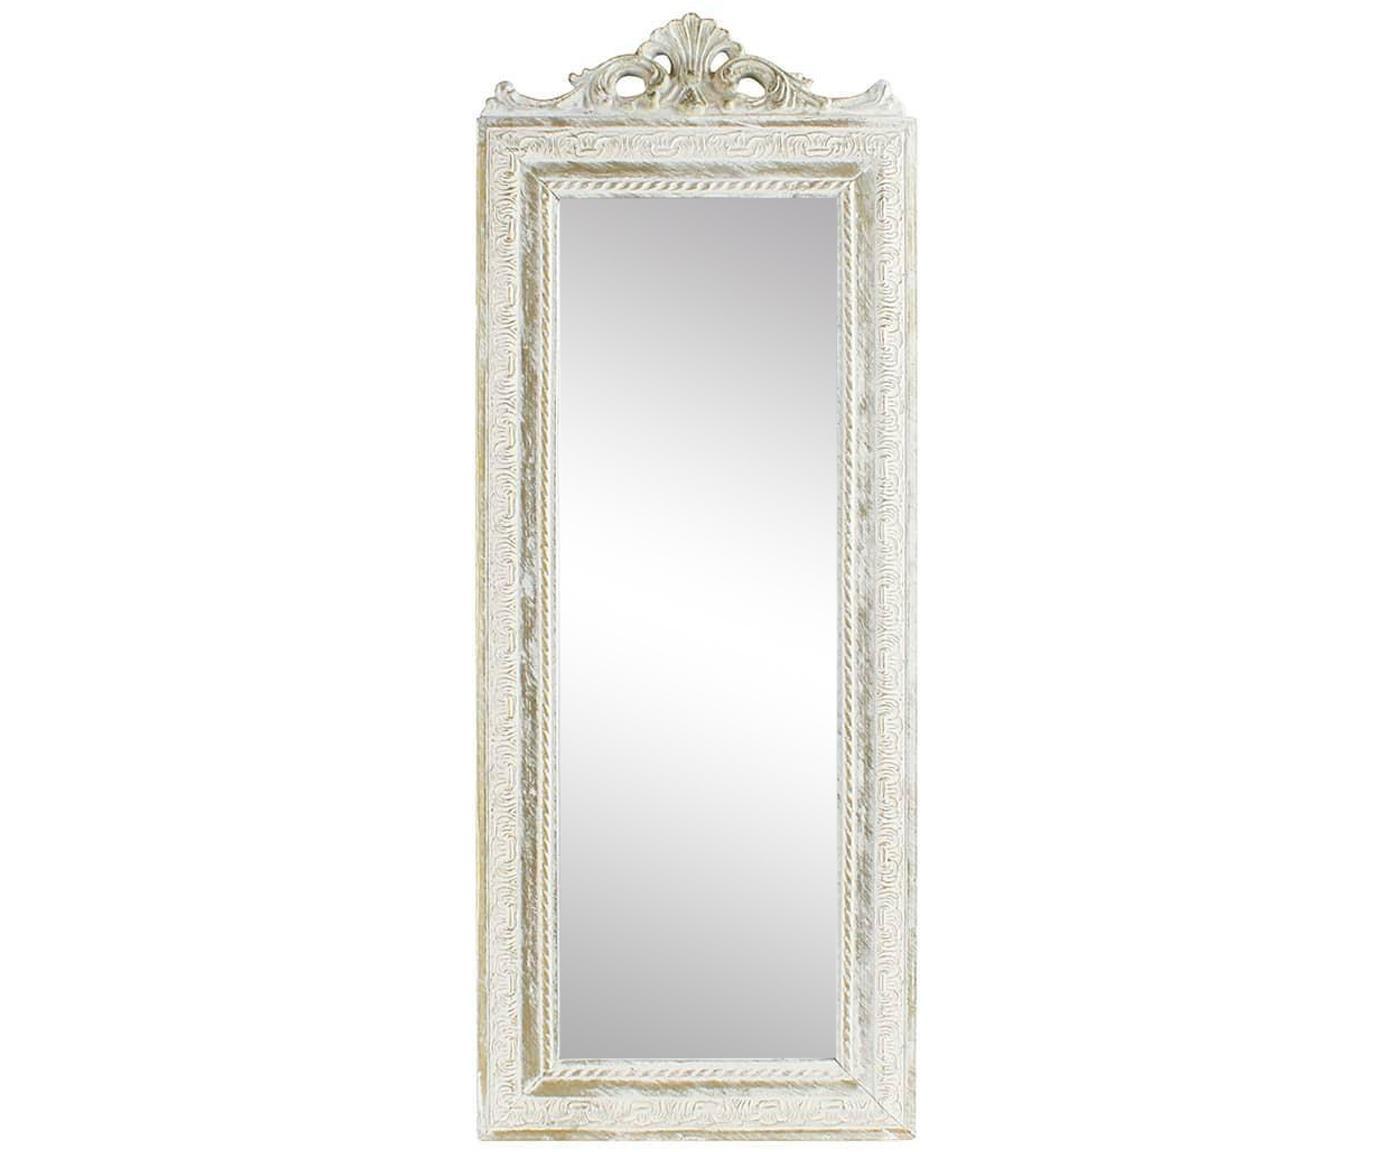 Espejo de pared Resi, Poliresina, espejo de cristal, Latón, marfil, An 35 x Al 90 cm